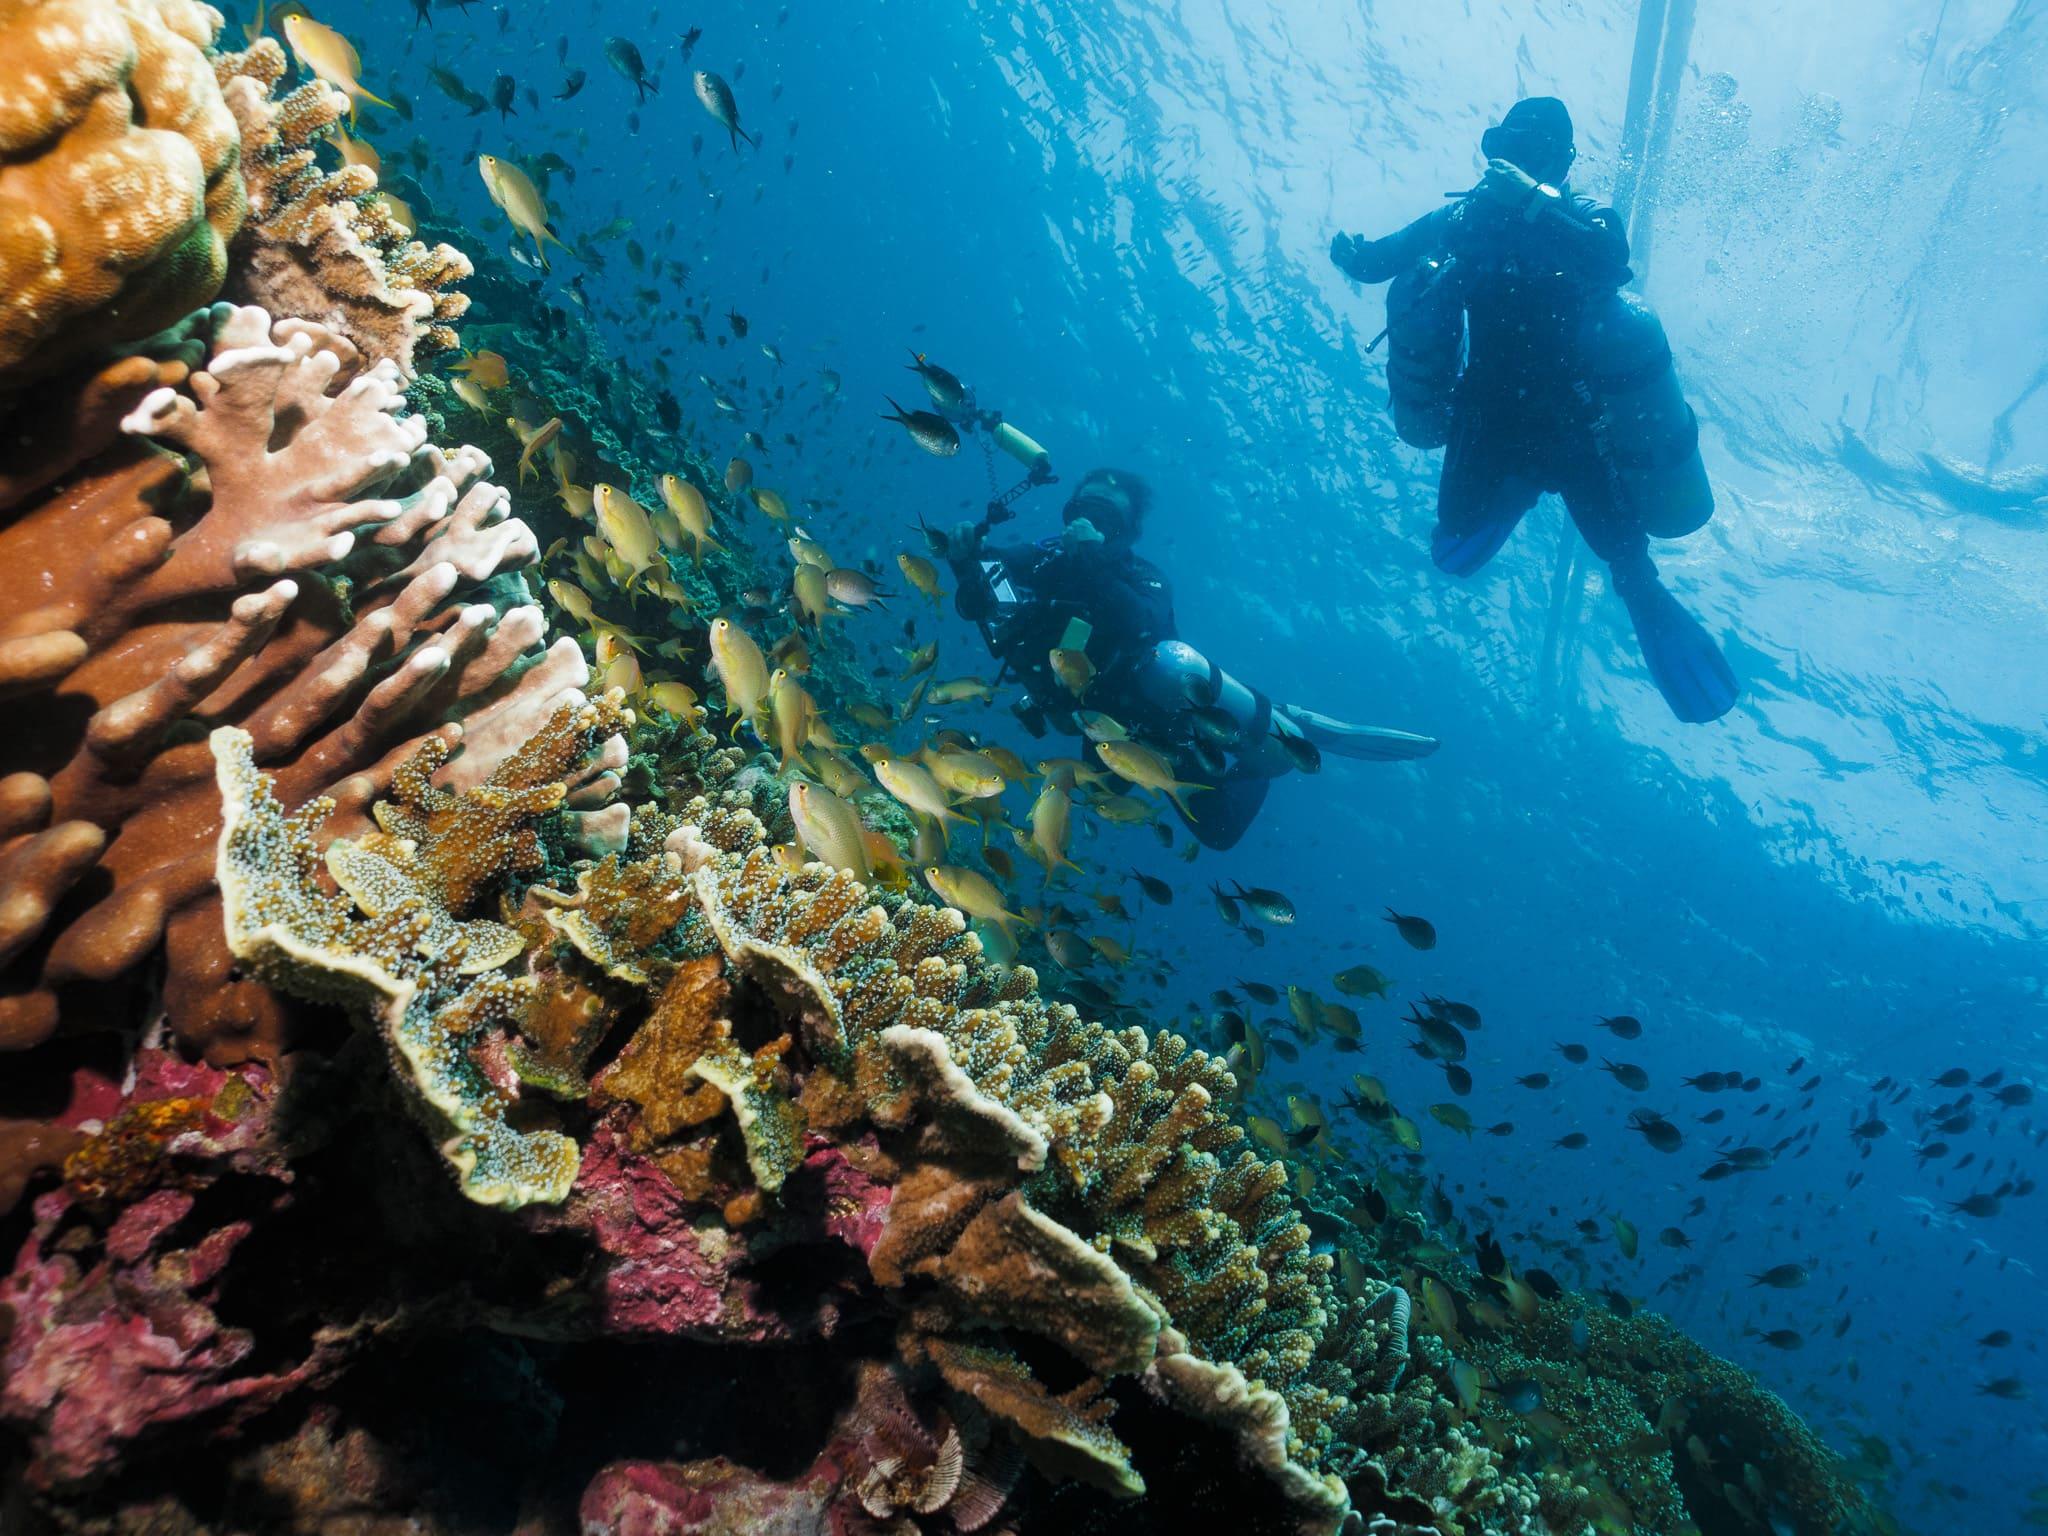 Beautiful corals at Ronda Bay Marine Sanctuary